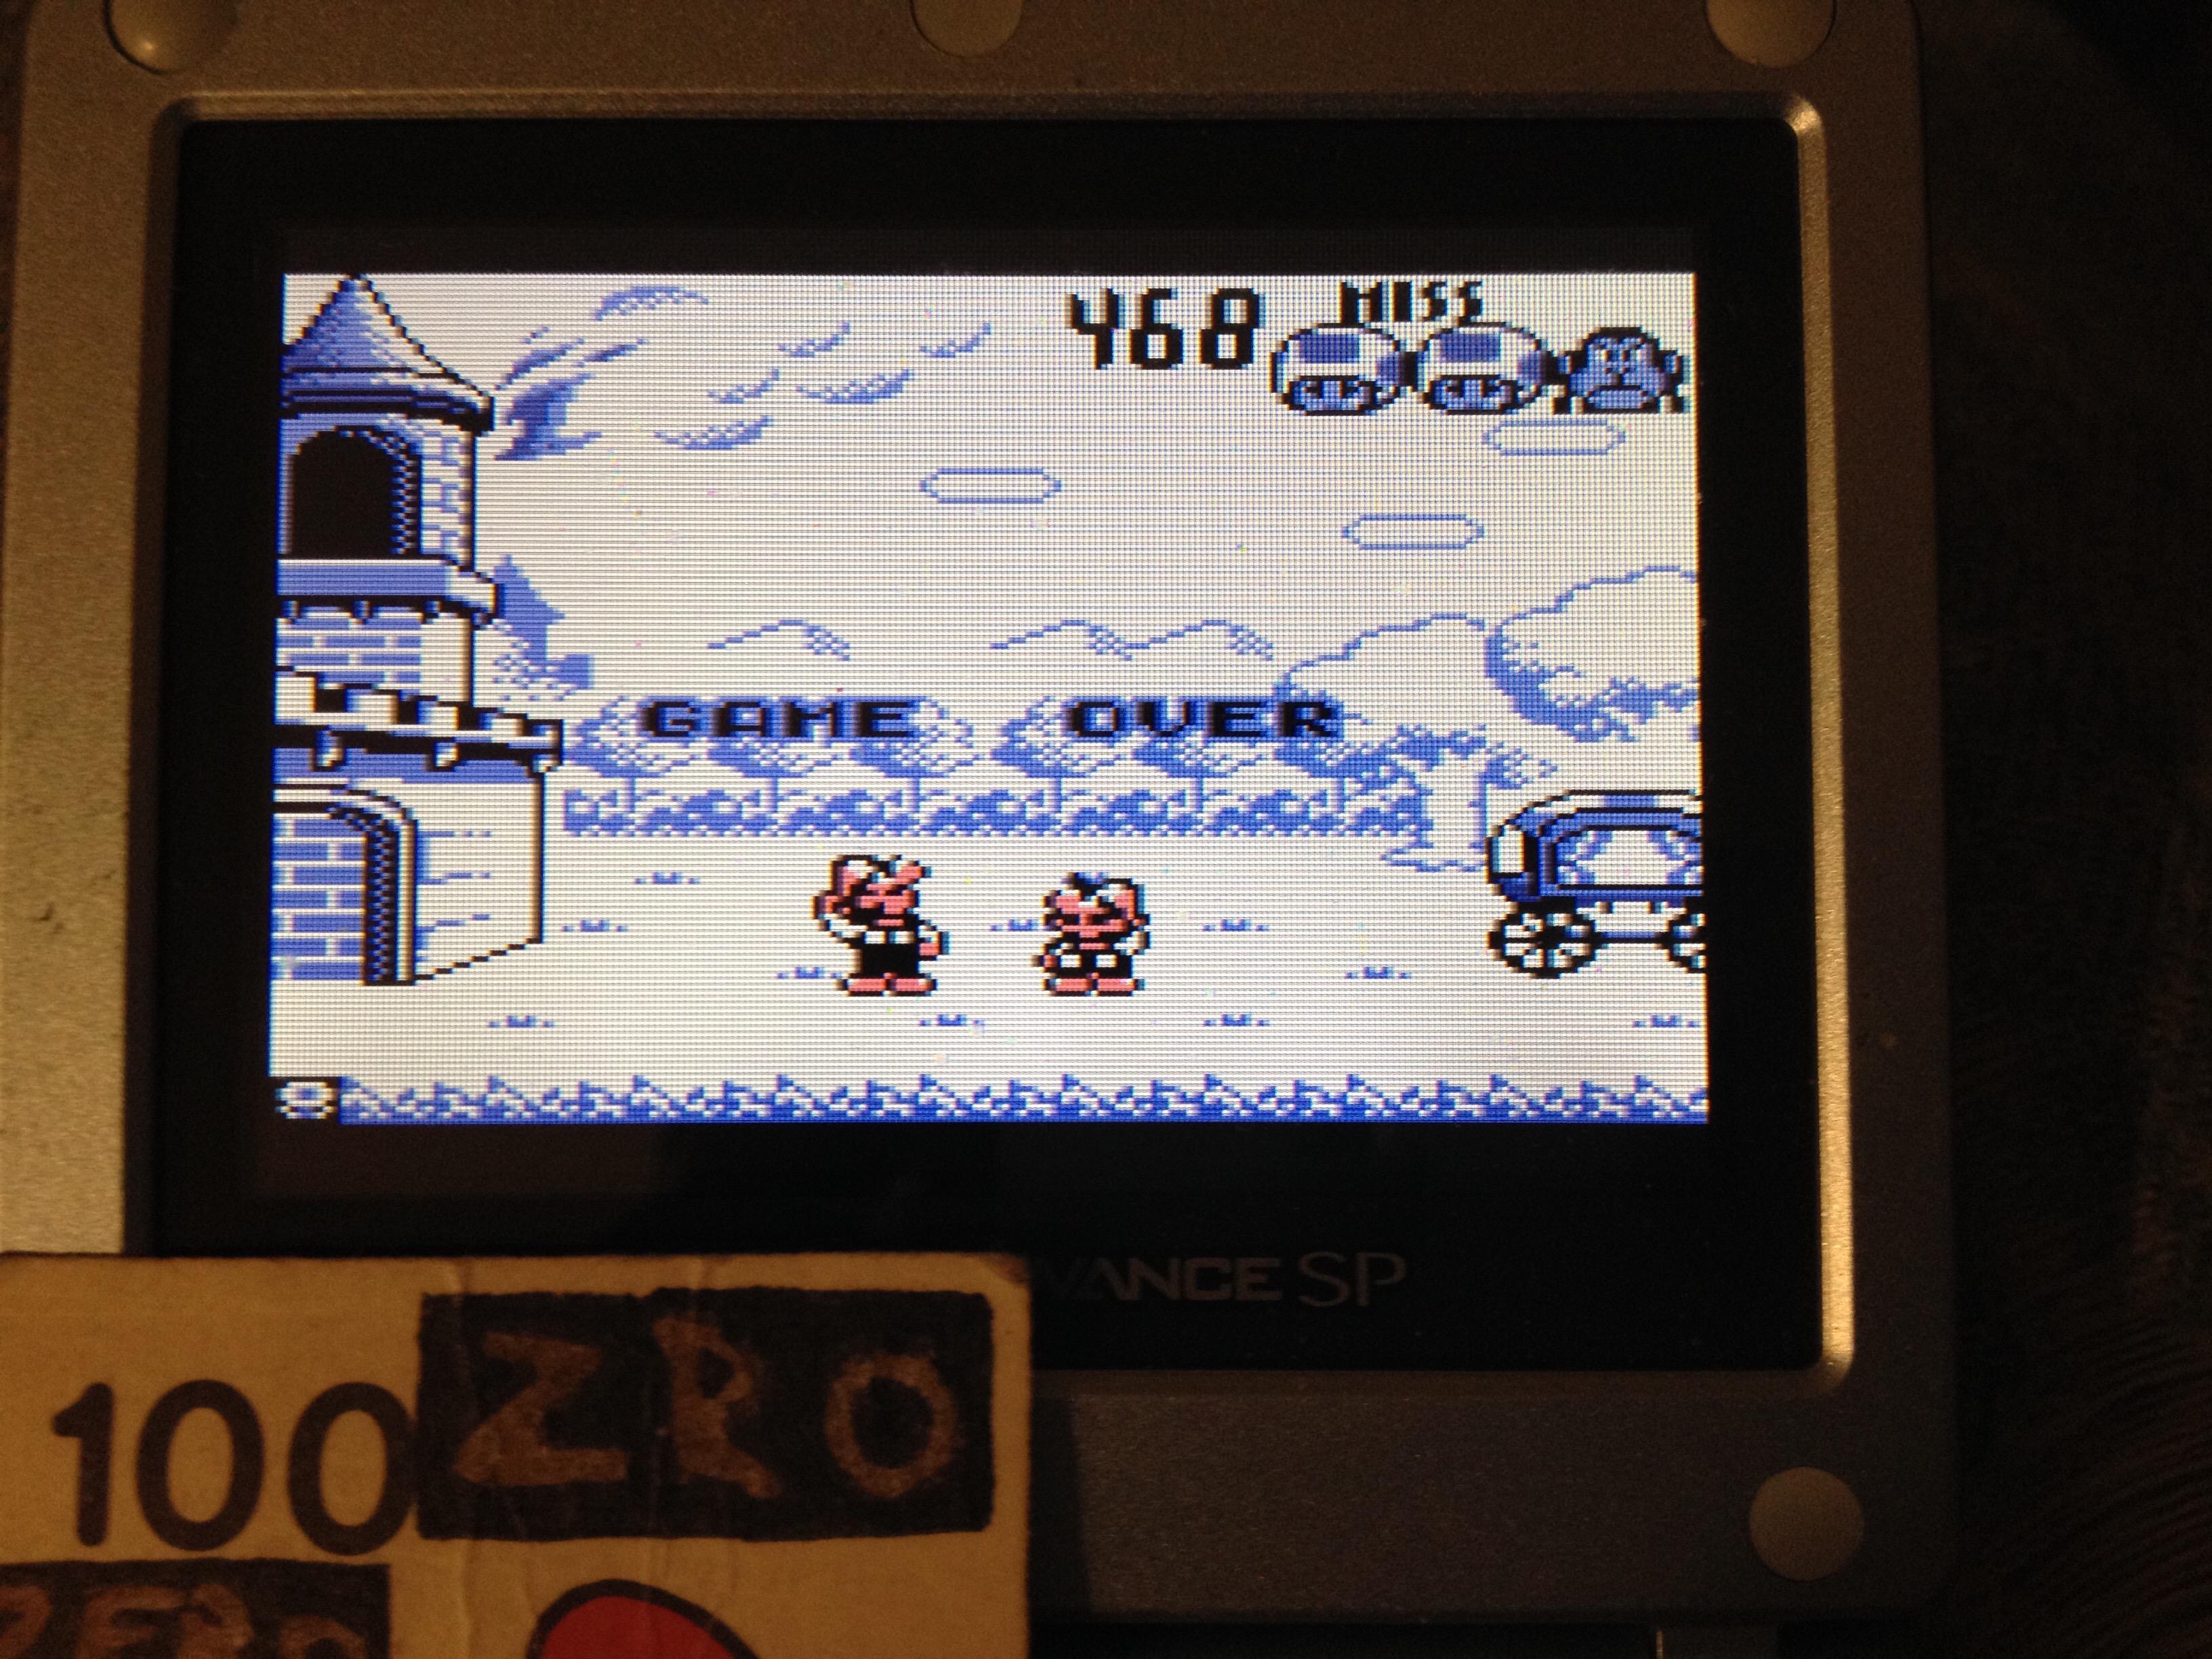 zerooskul: Game & Watch Gallery: Fire [Modern: Hard] (Game Boy) 468 points on 2019-05-30 01:46:12